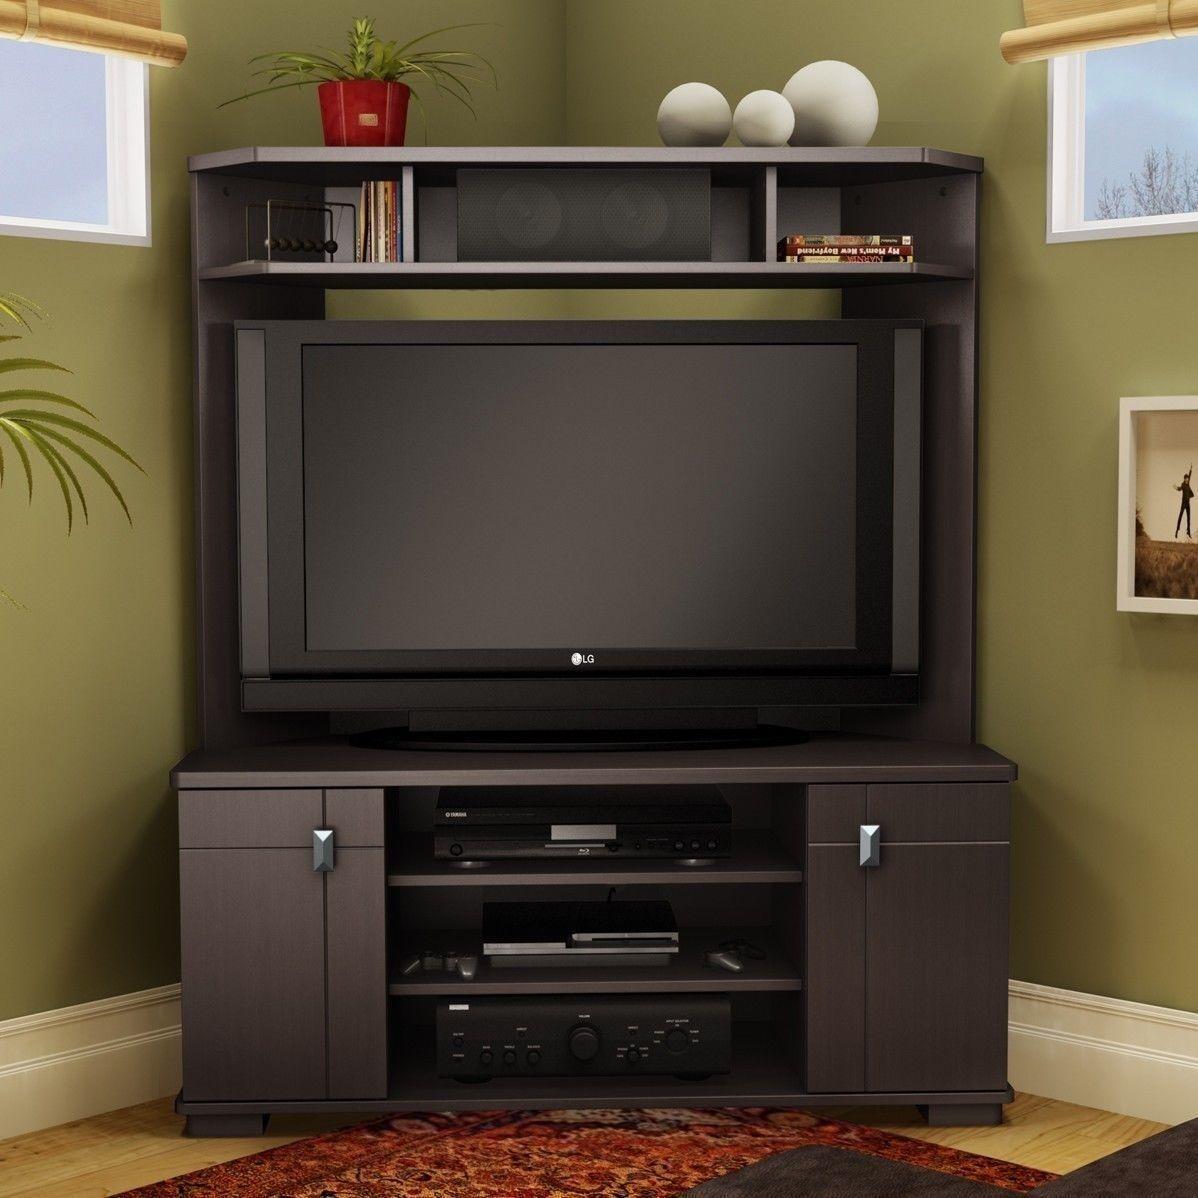 New 42 Inch Corner Tv Stand Dk Brown Entertainment Media Storage